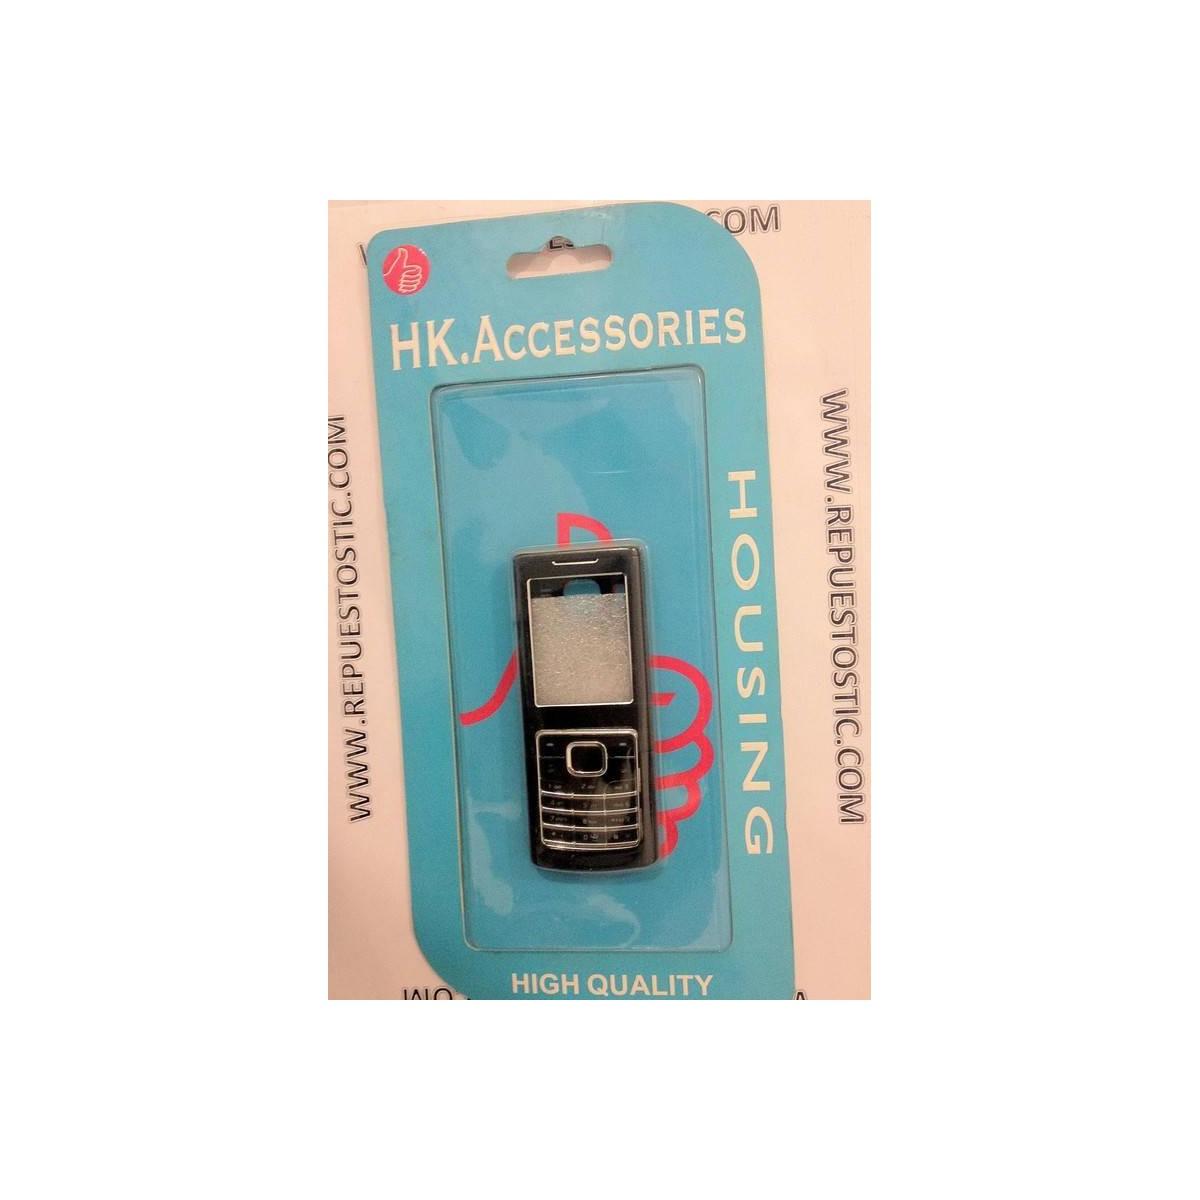 Carcaça Nokia 6500 clasic cor Preto